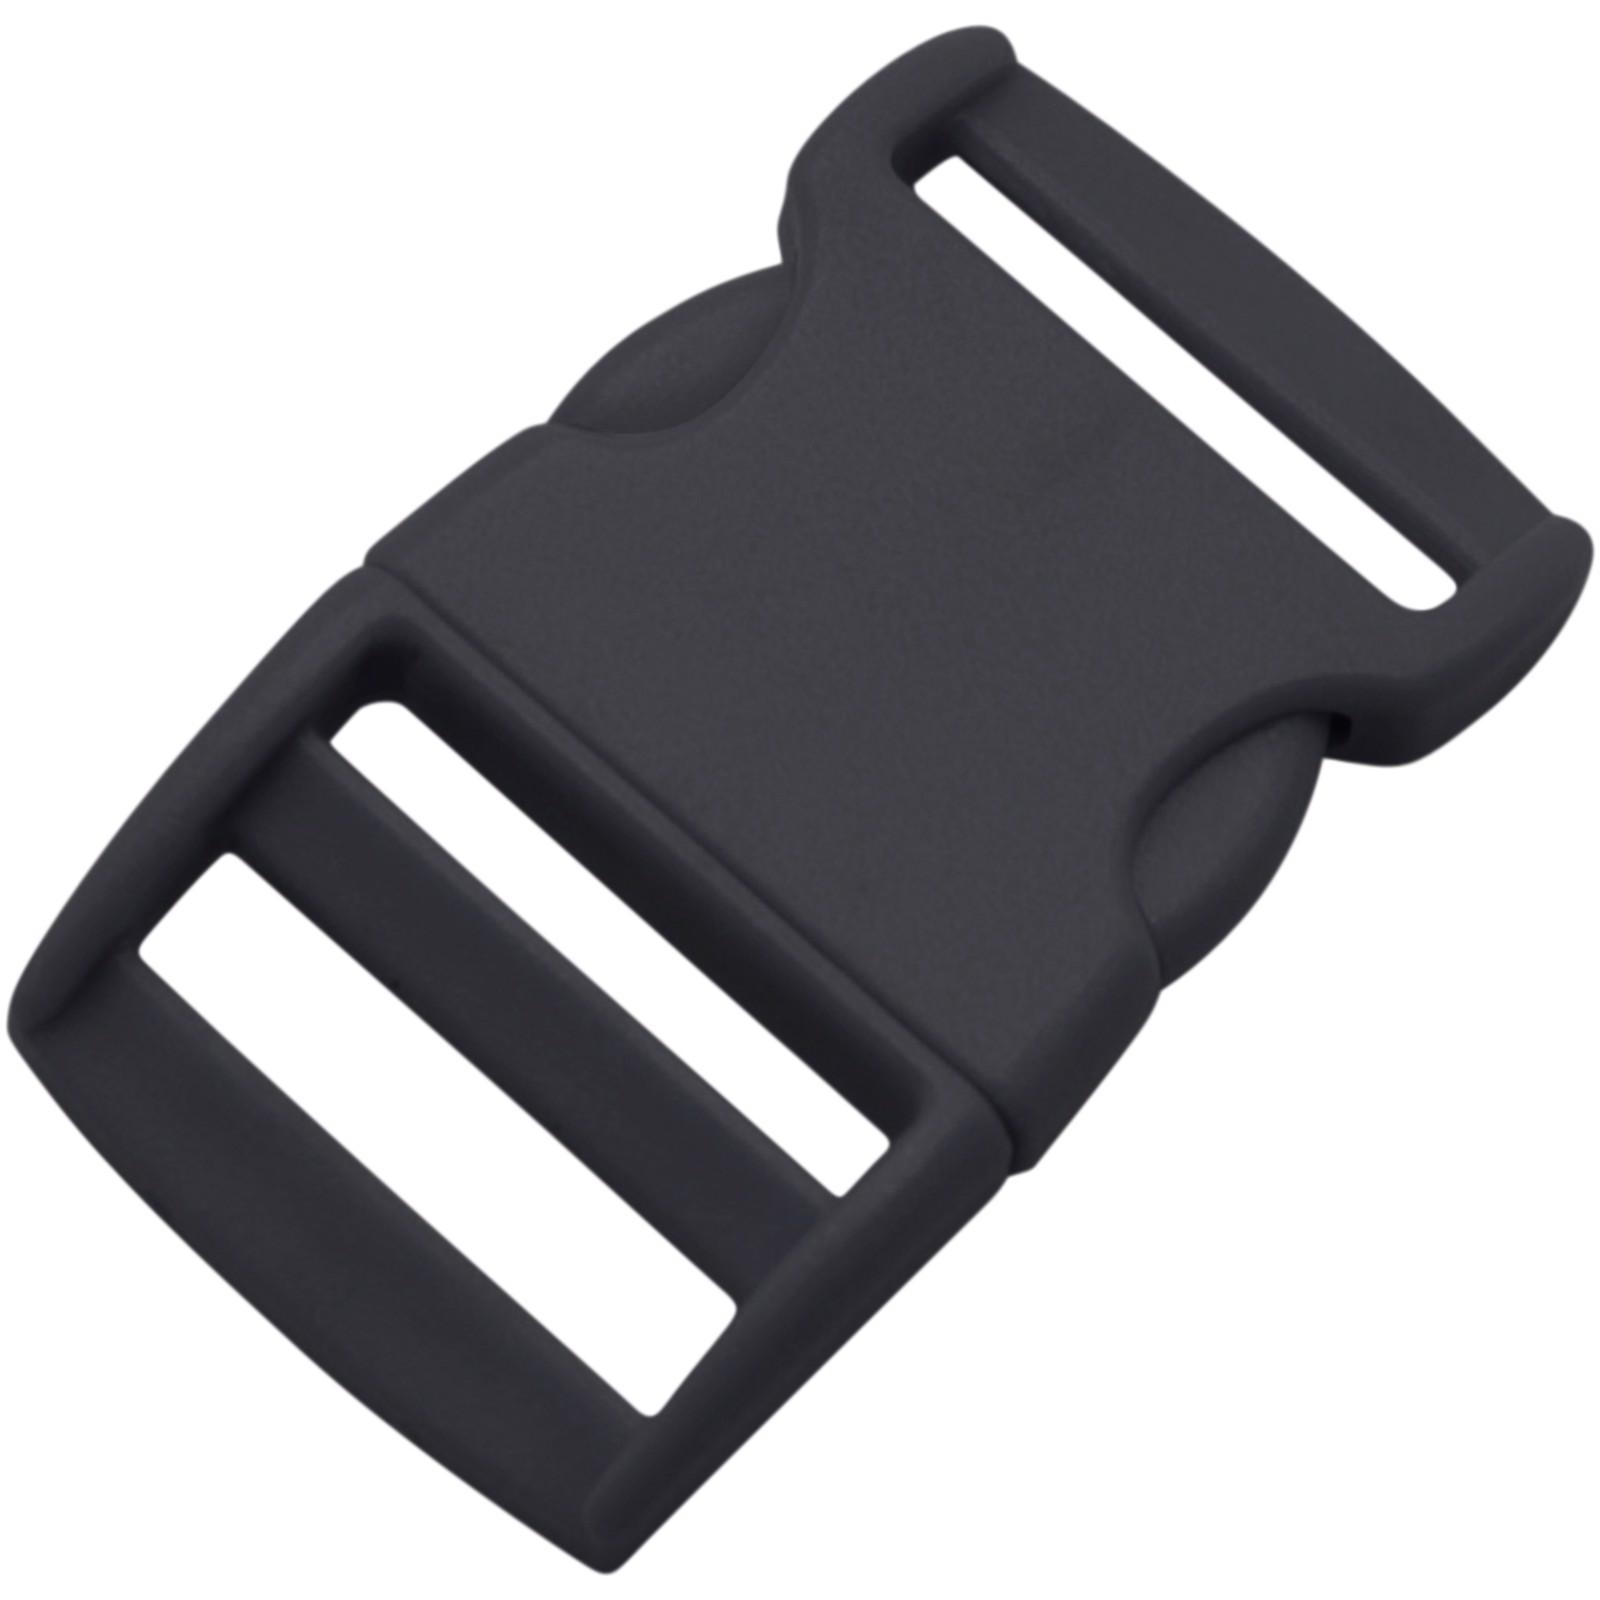 Plastic release buckle - Solid Black